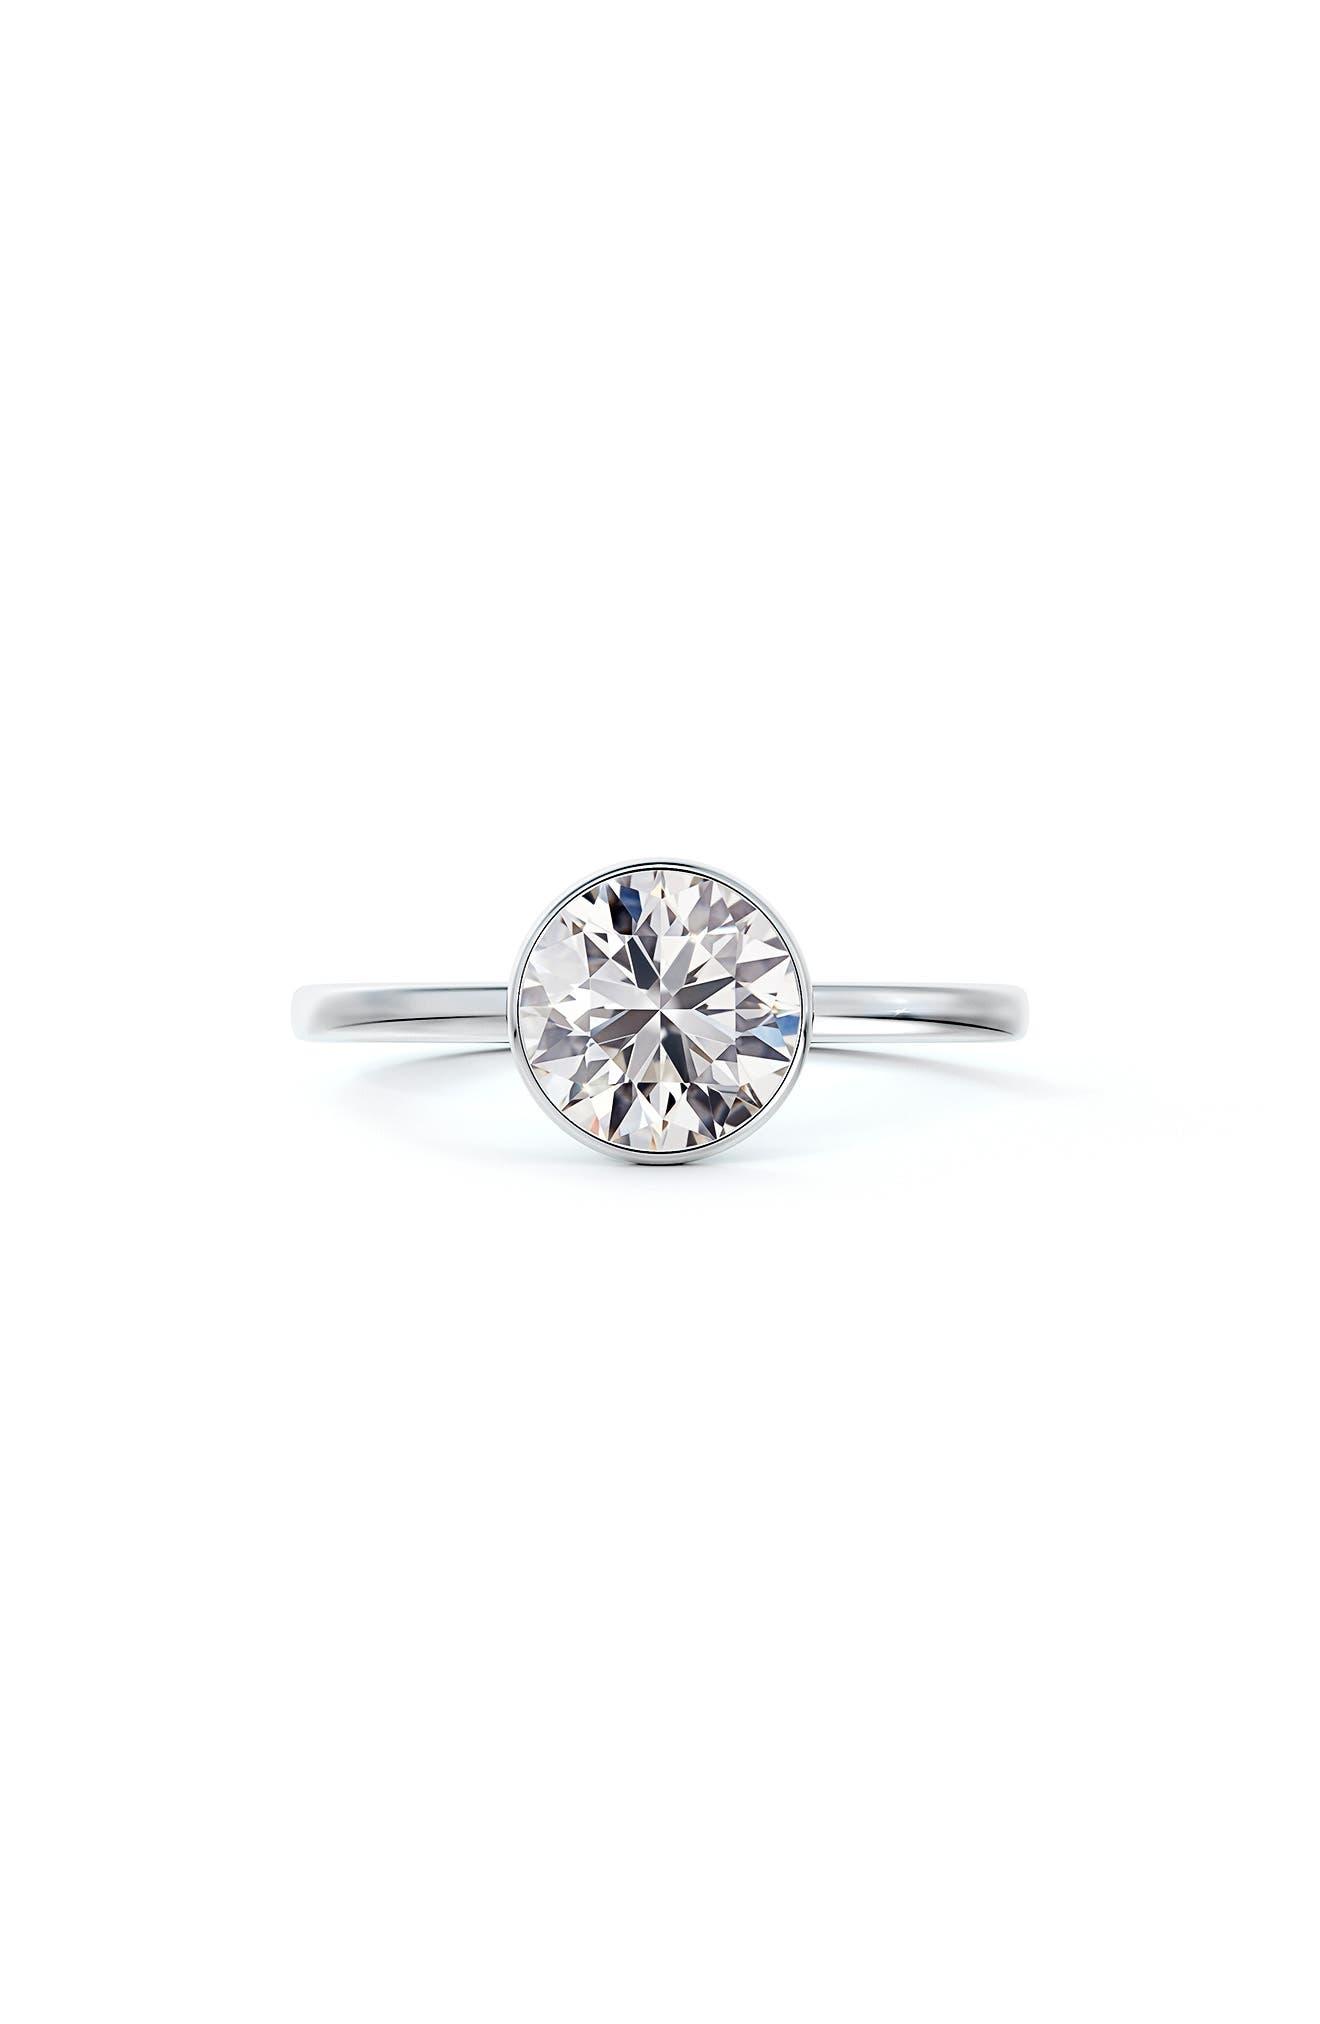 X Michaela Hidden Halo Bezel Set Diamond Engagement Ring